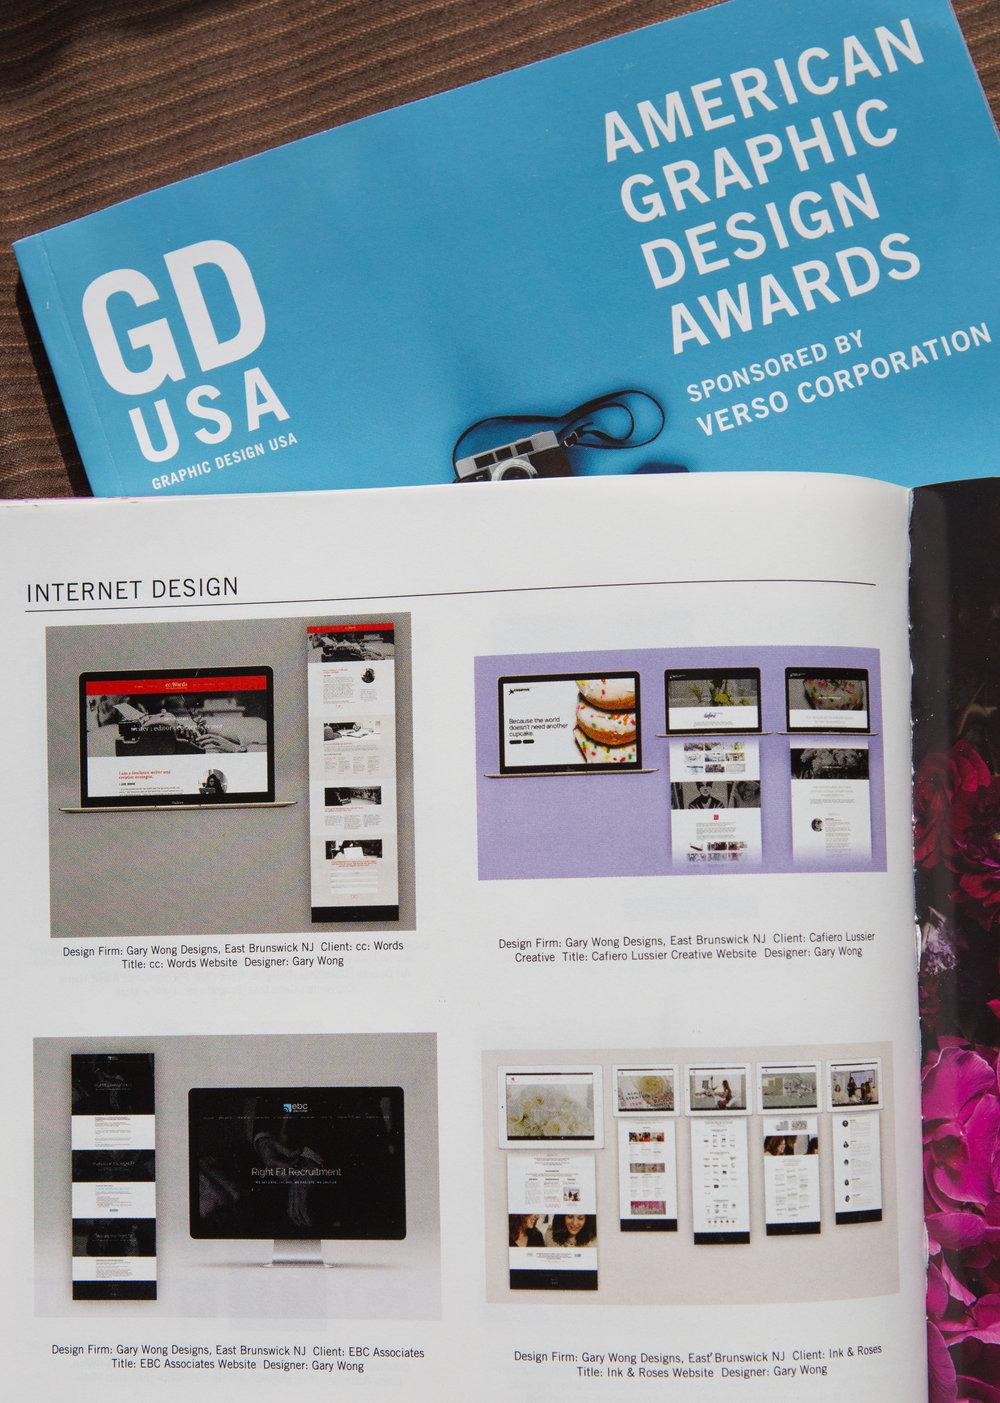 Category: Internet Design Clients (L to R, Top-Down): cc: Words:www.ccwords.com Cafiero Lussier Creative:www.cafierolussier.com EBC Associates:www.ebcassociates.net Ink & Roses:www.inkandroses.com